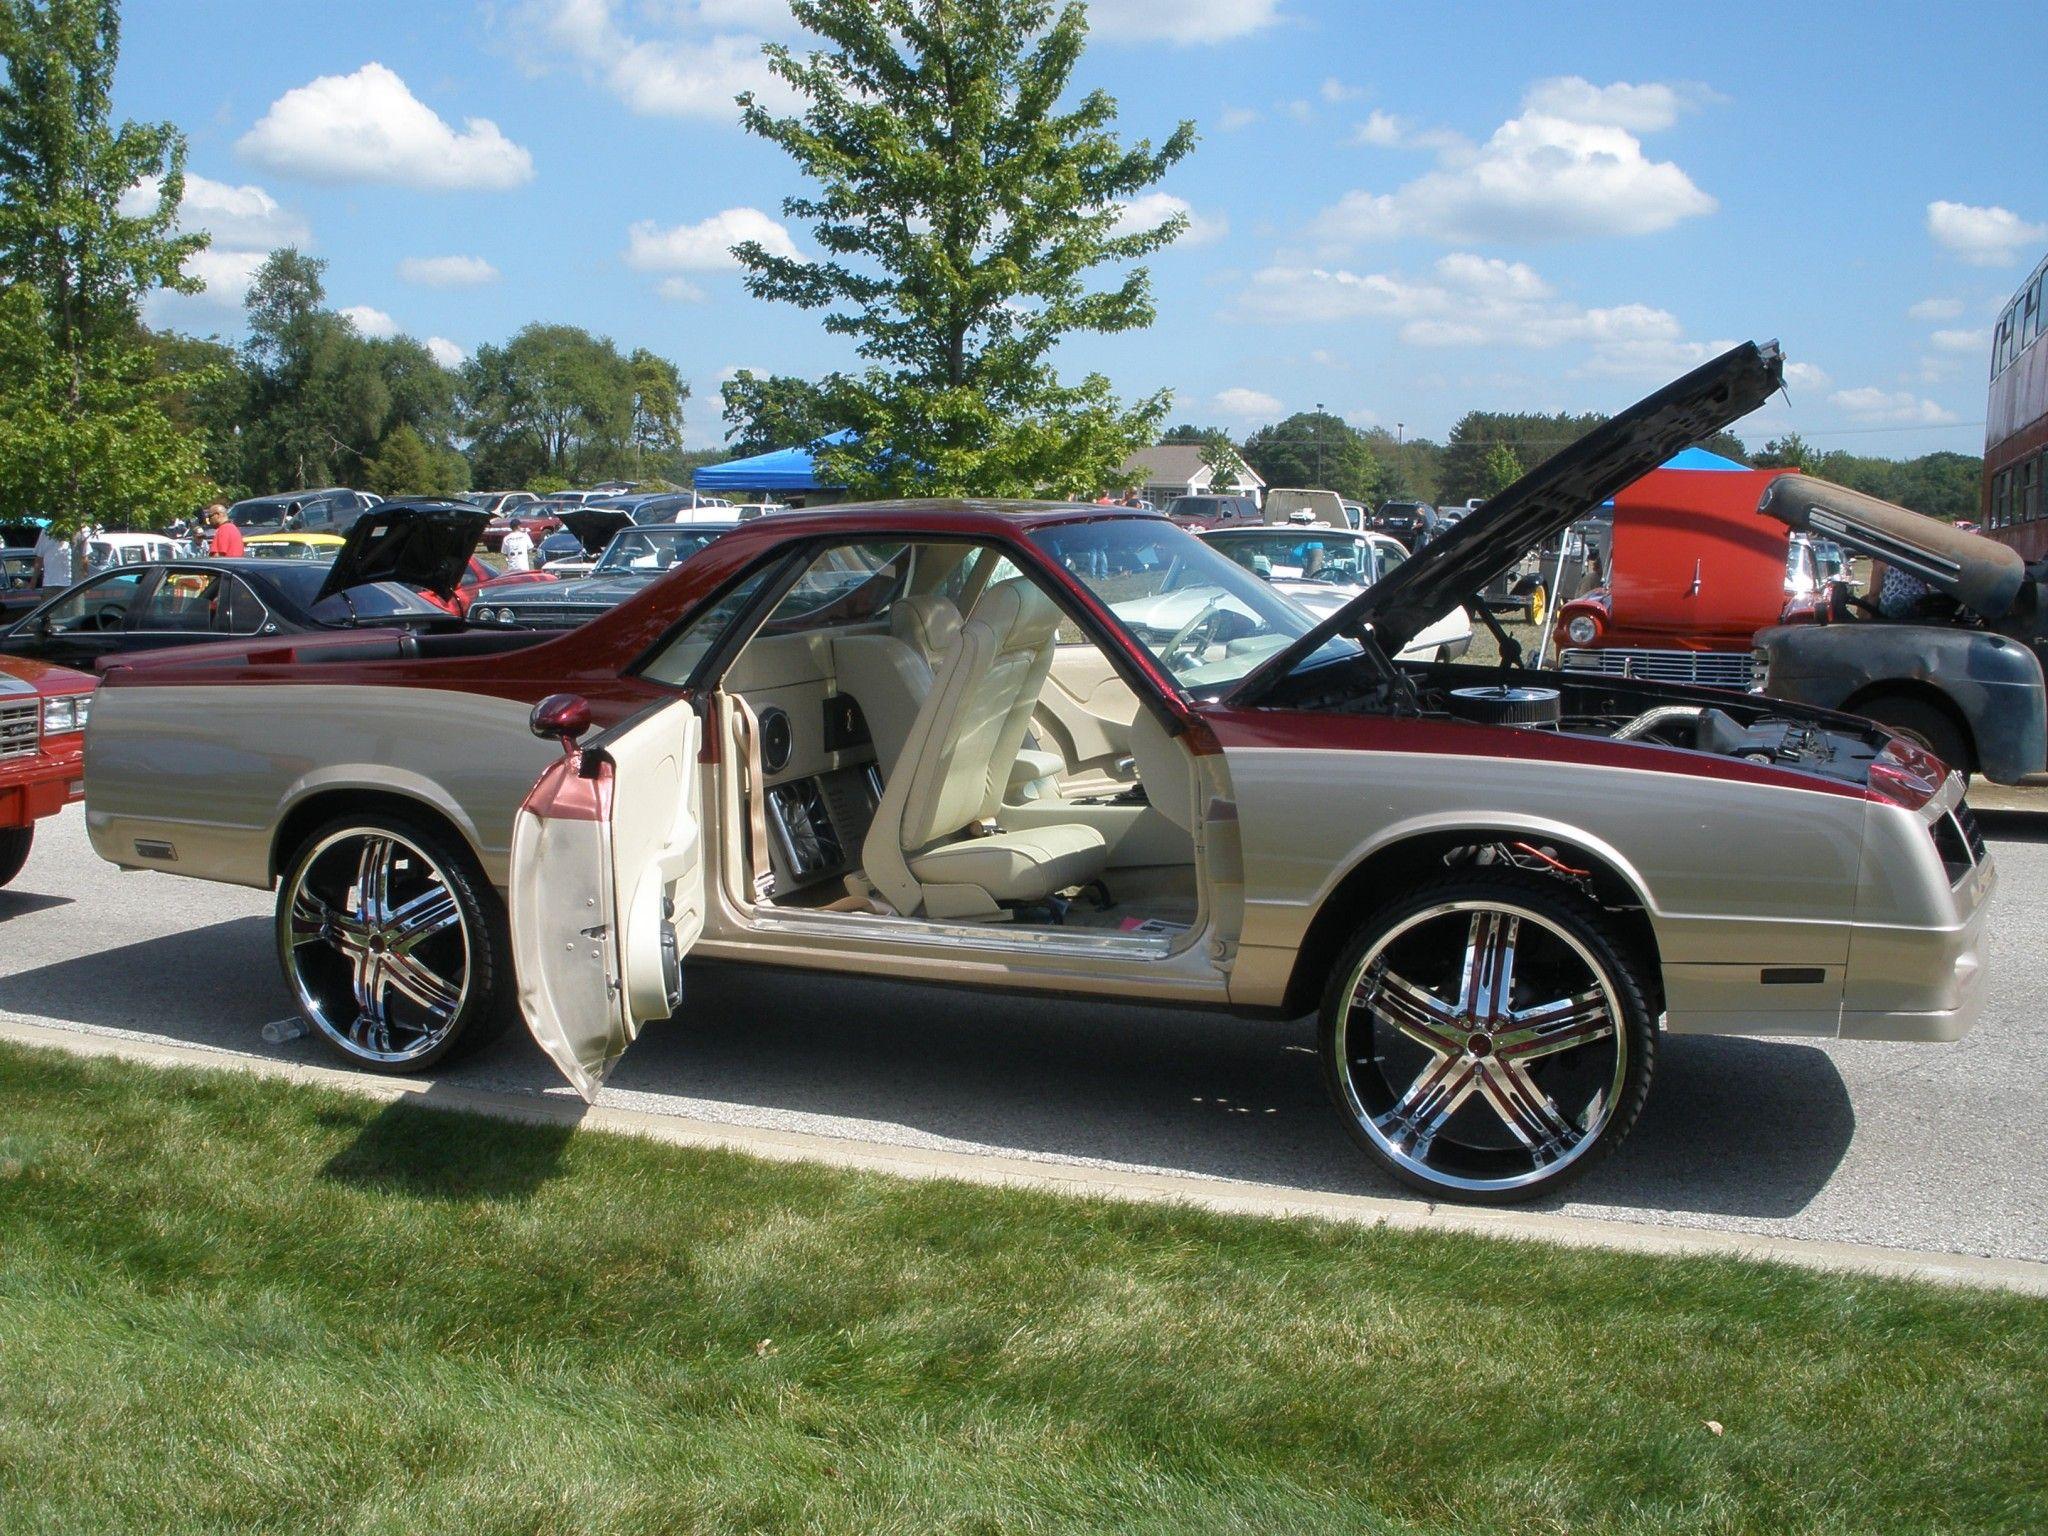 30 inch rims on impala box chevy on 30 inch ballers wheels big rims custom wheels [ 2048 x 1536 Pixel ]